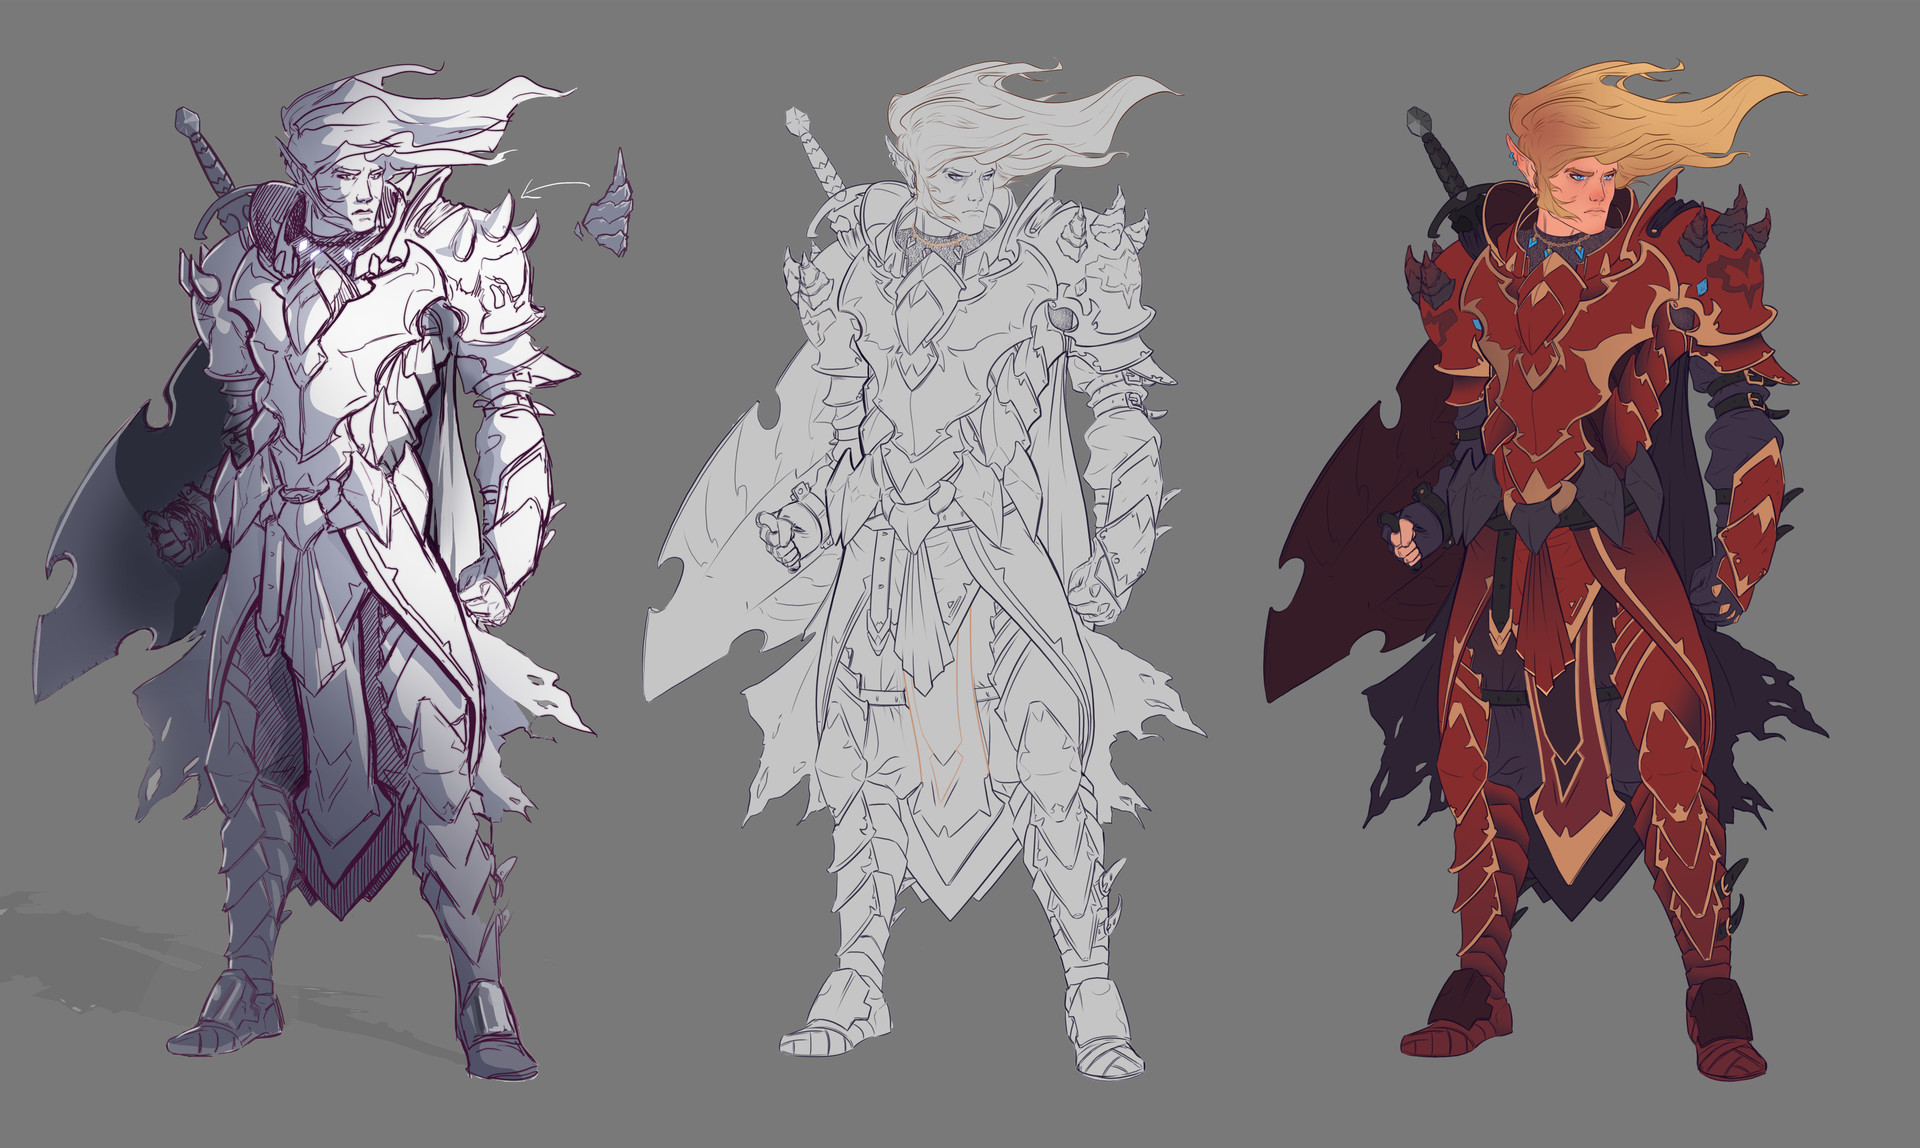 Nico fari characterdesign